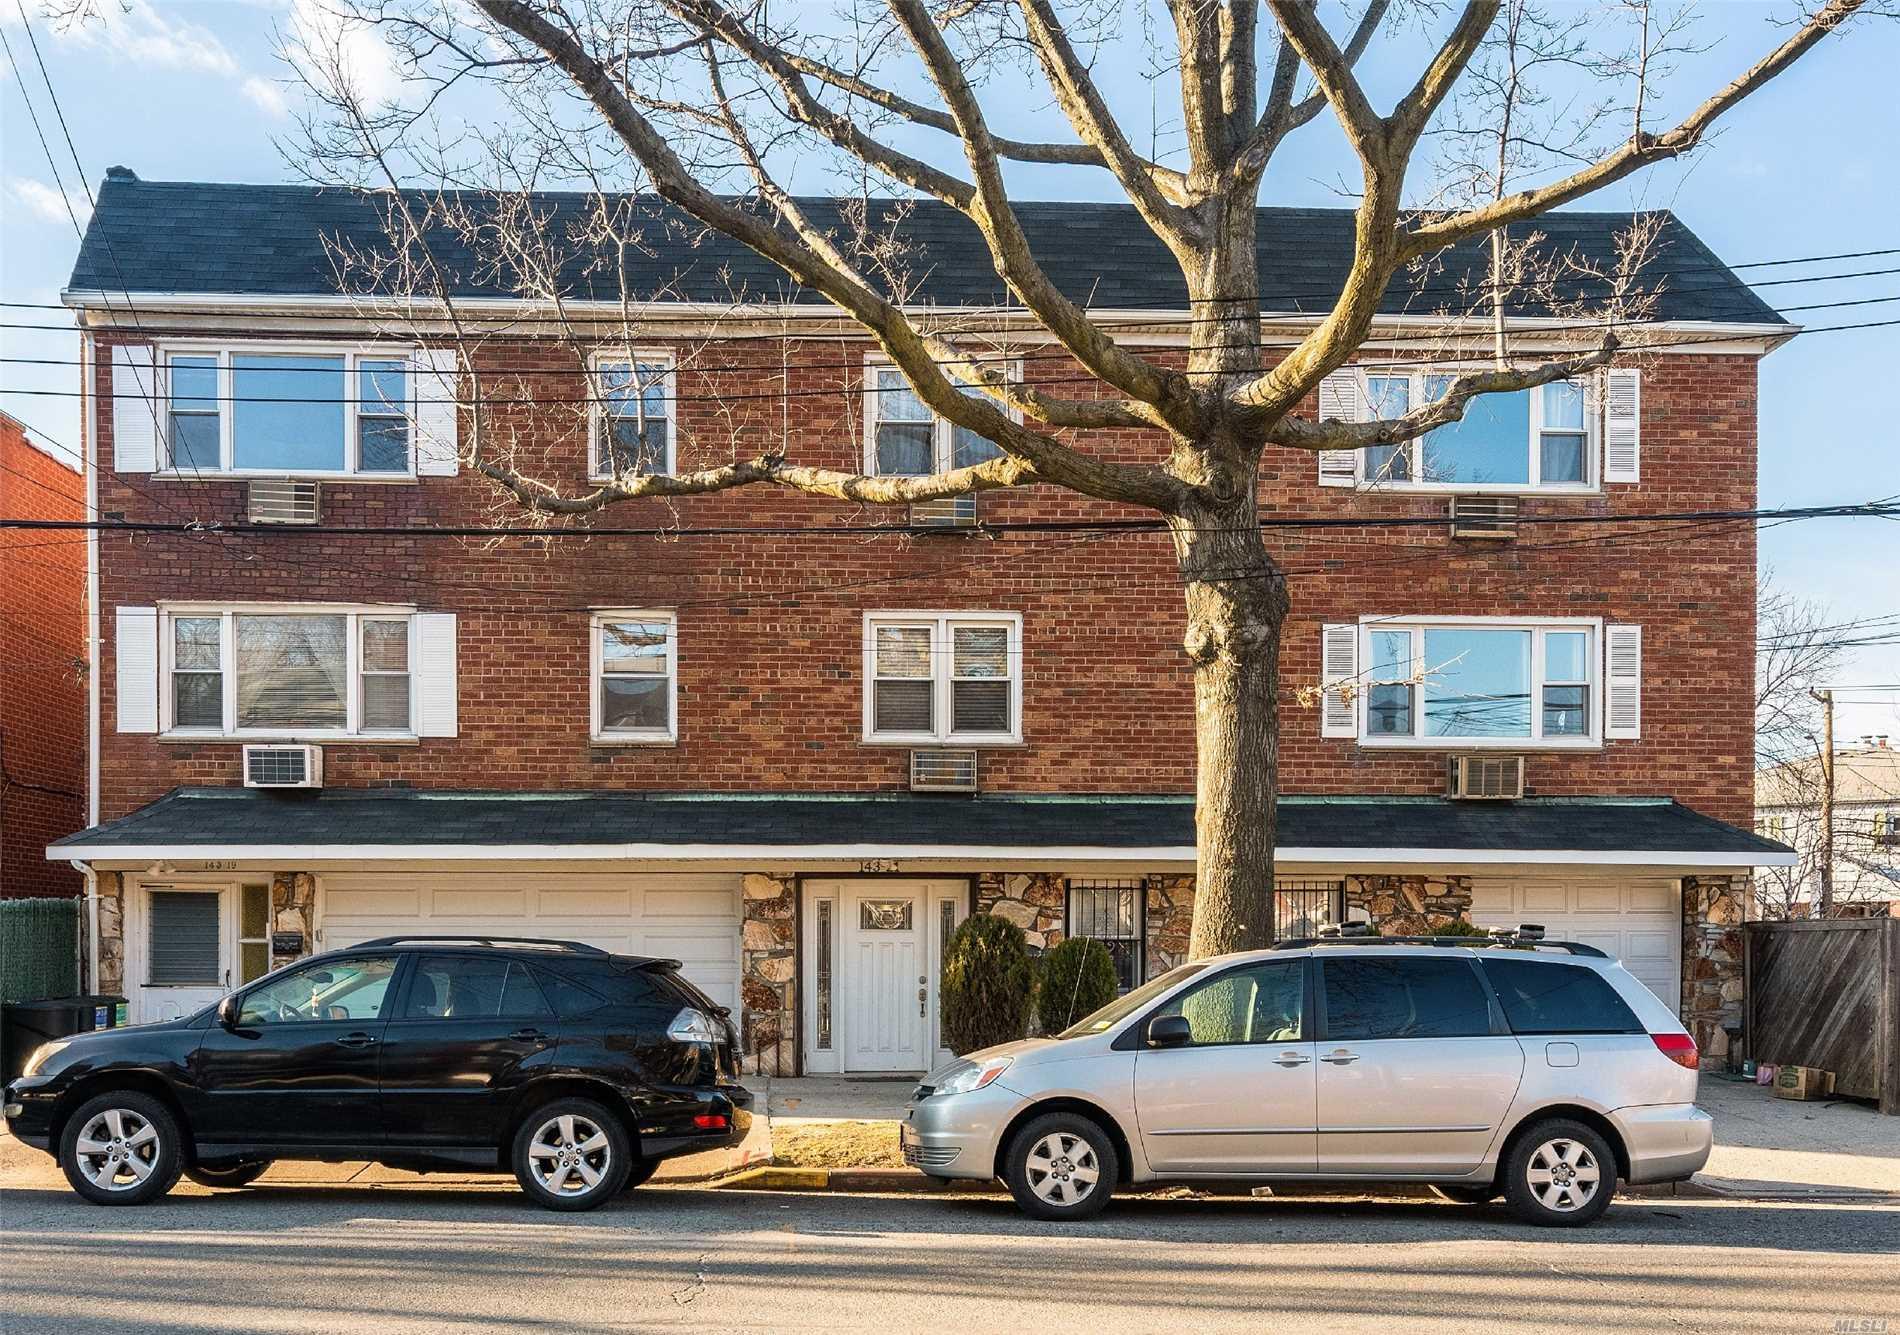 Property for sale at 143-19 Willets point Boulevard, Whitestone NY 11357, Whitestone,  New York 11357